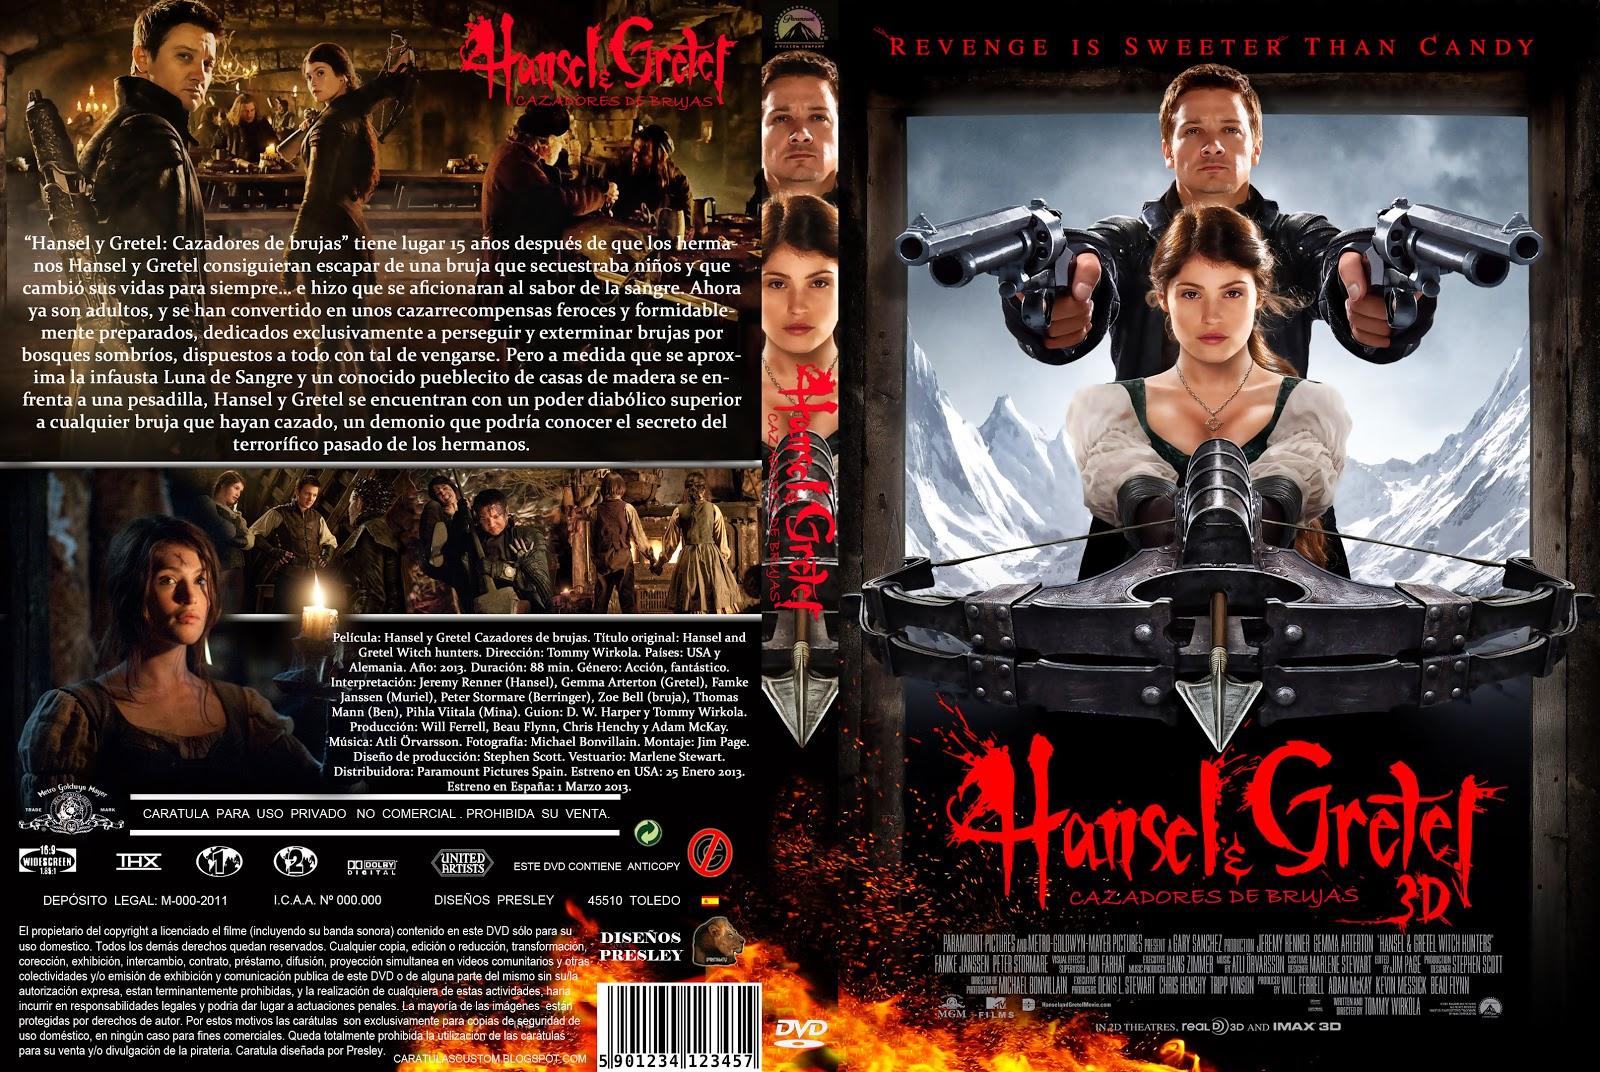 http://3.bp.blogspot.com/-C3wKlRN-85I/USjkpMdPgYI/AAAAAAAAFE0/I-N2KEpuEVE/s1600/hansel+y+gretel+cazadores+de+brujas+dvd.jpg